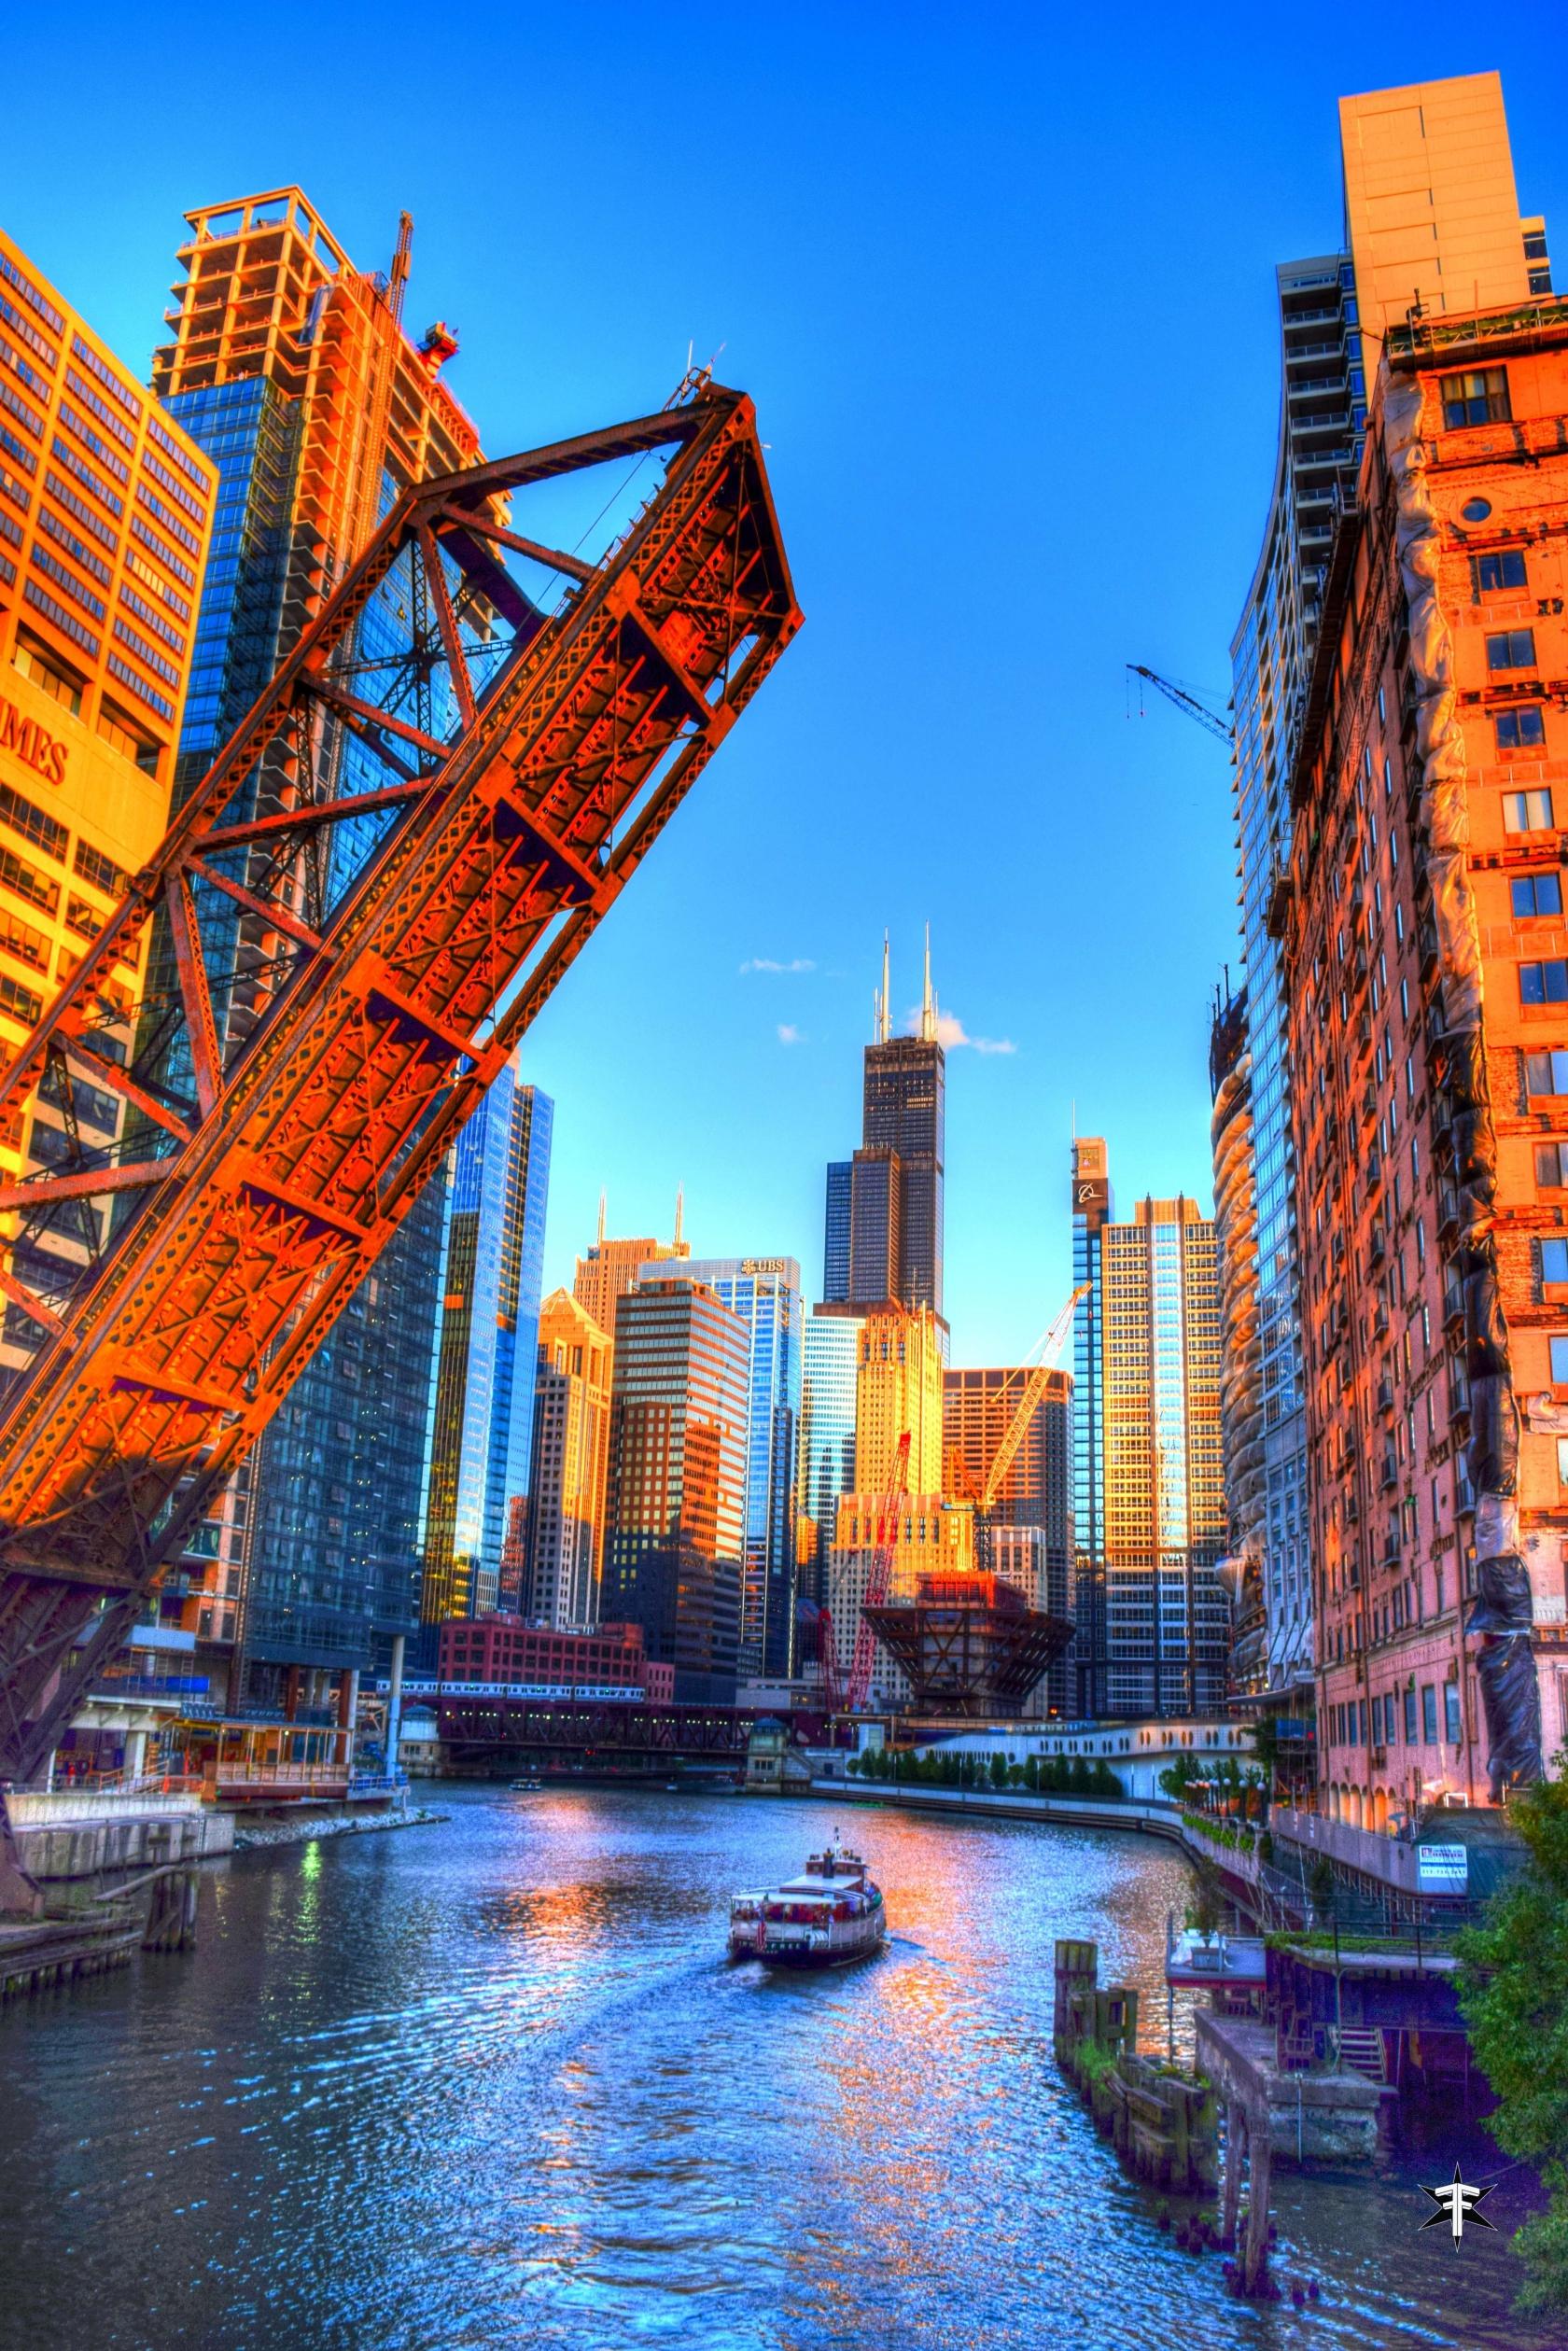 batch_golden hour chicago wolf point buildings.jpg